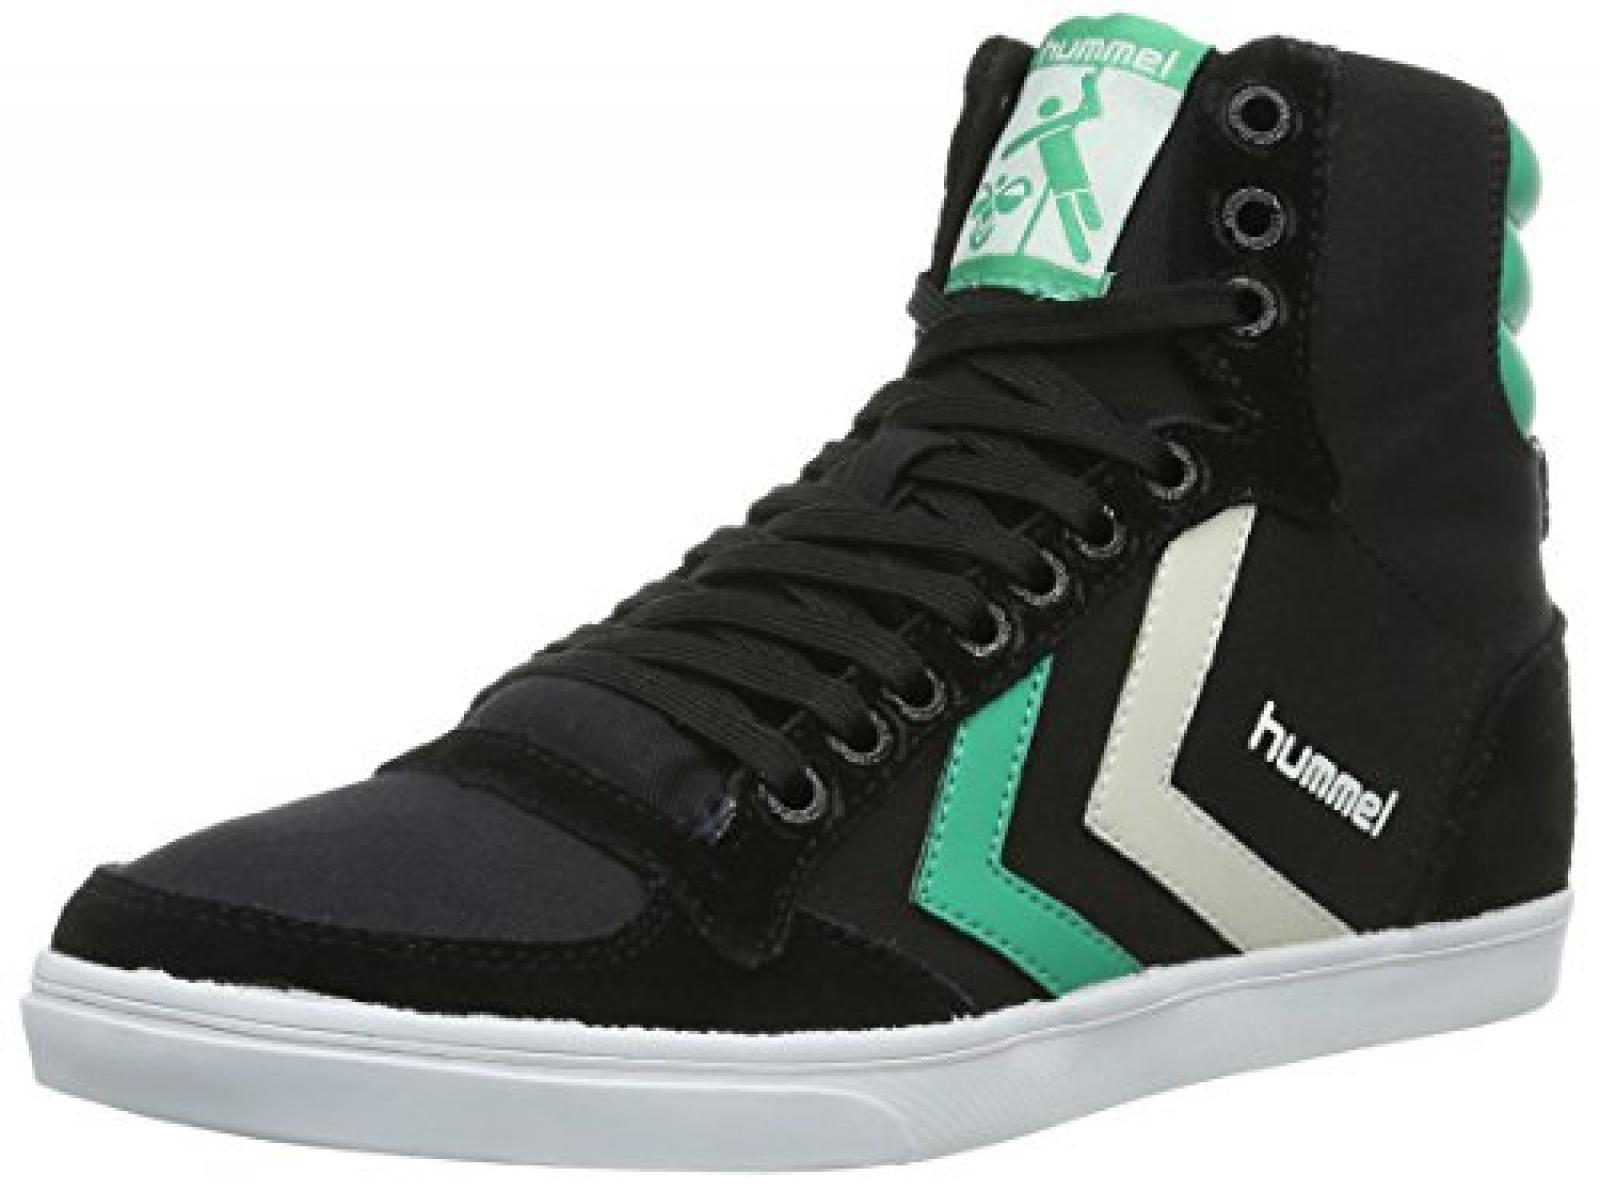 hummel SLIMMER STADIL HIGH Unisex-Erwachsene Hohe Sneakers